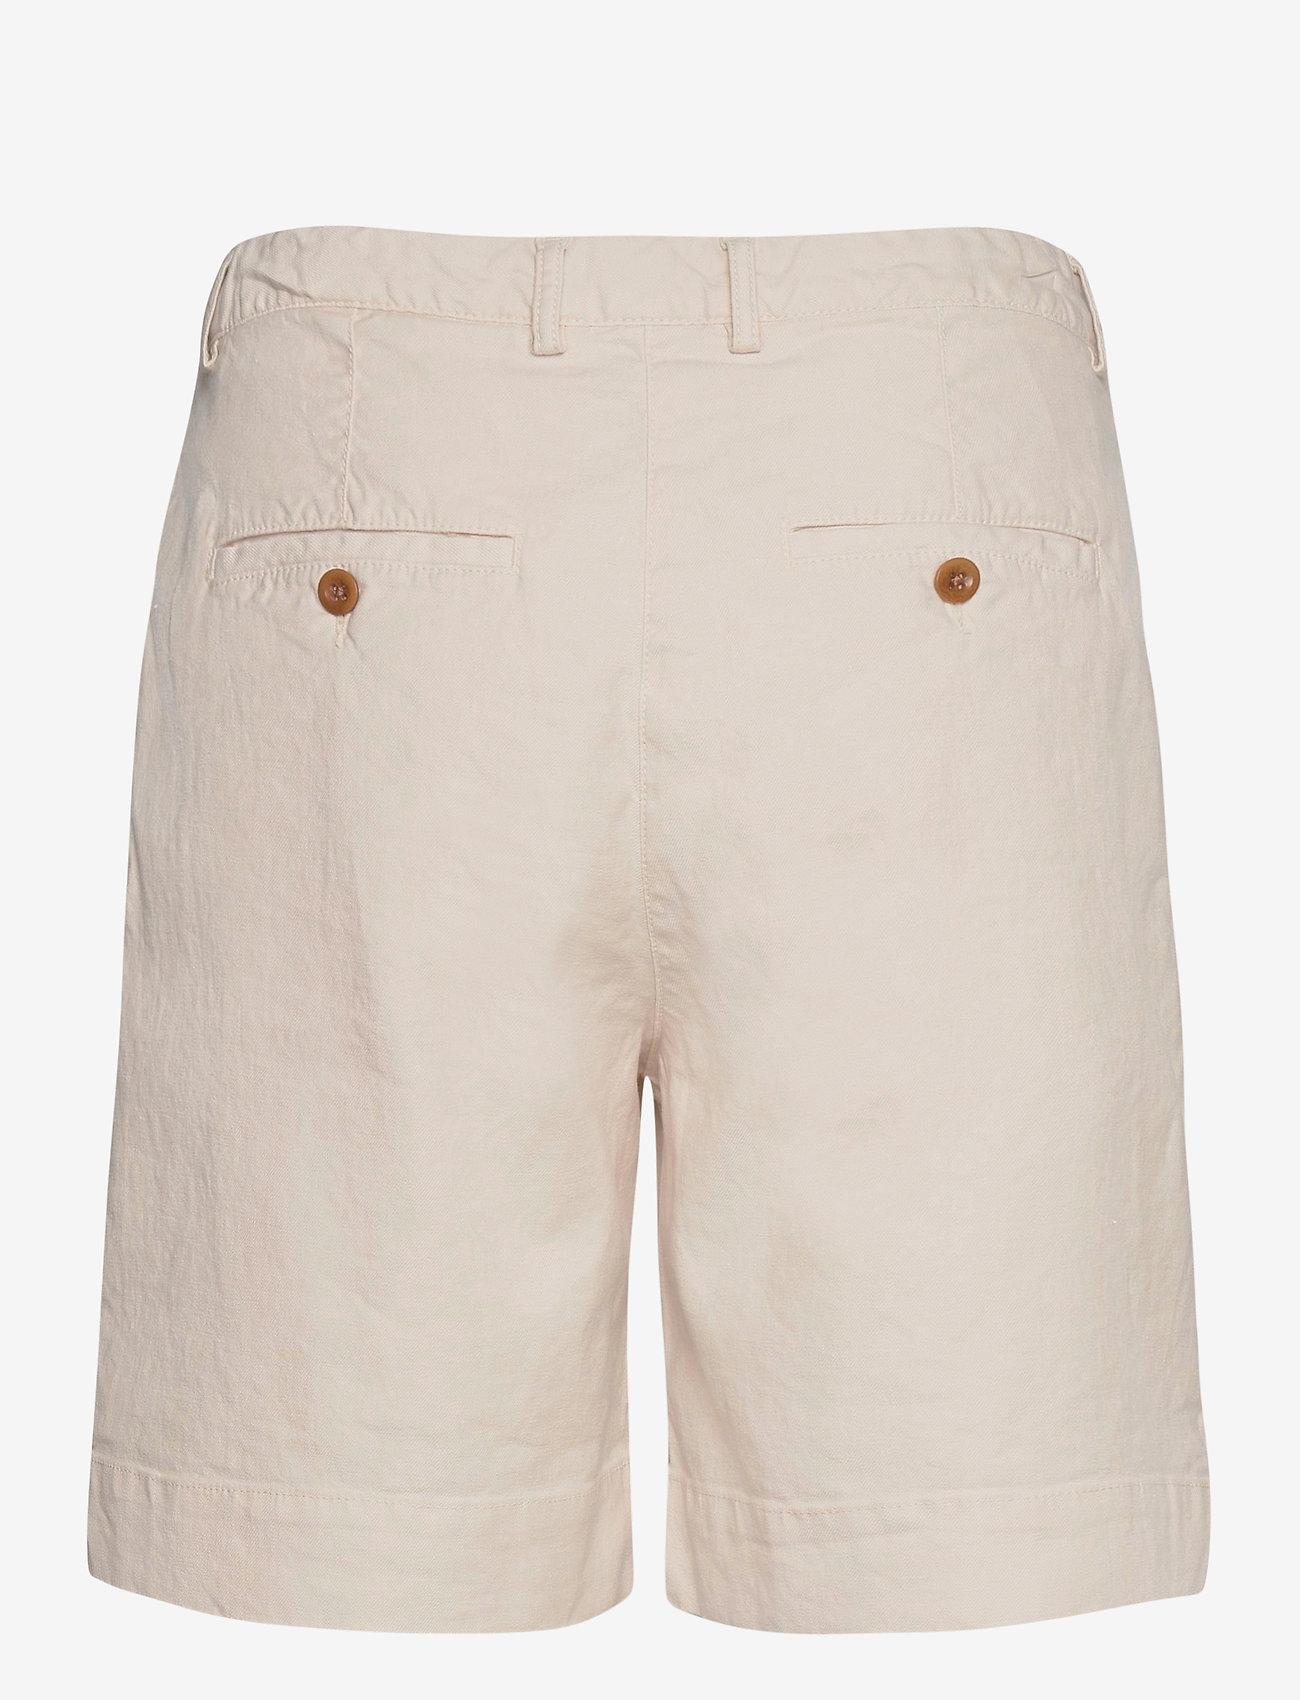 GANT - D1. HW PLEATED CITY SHORTS - chino shorts - putty - 1